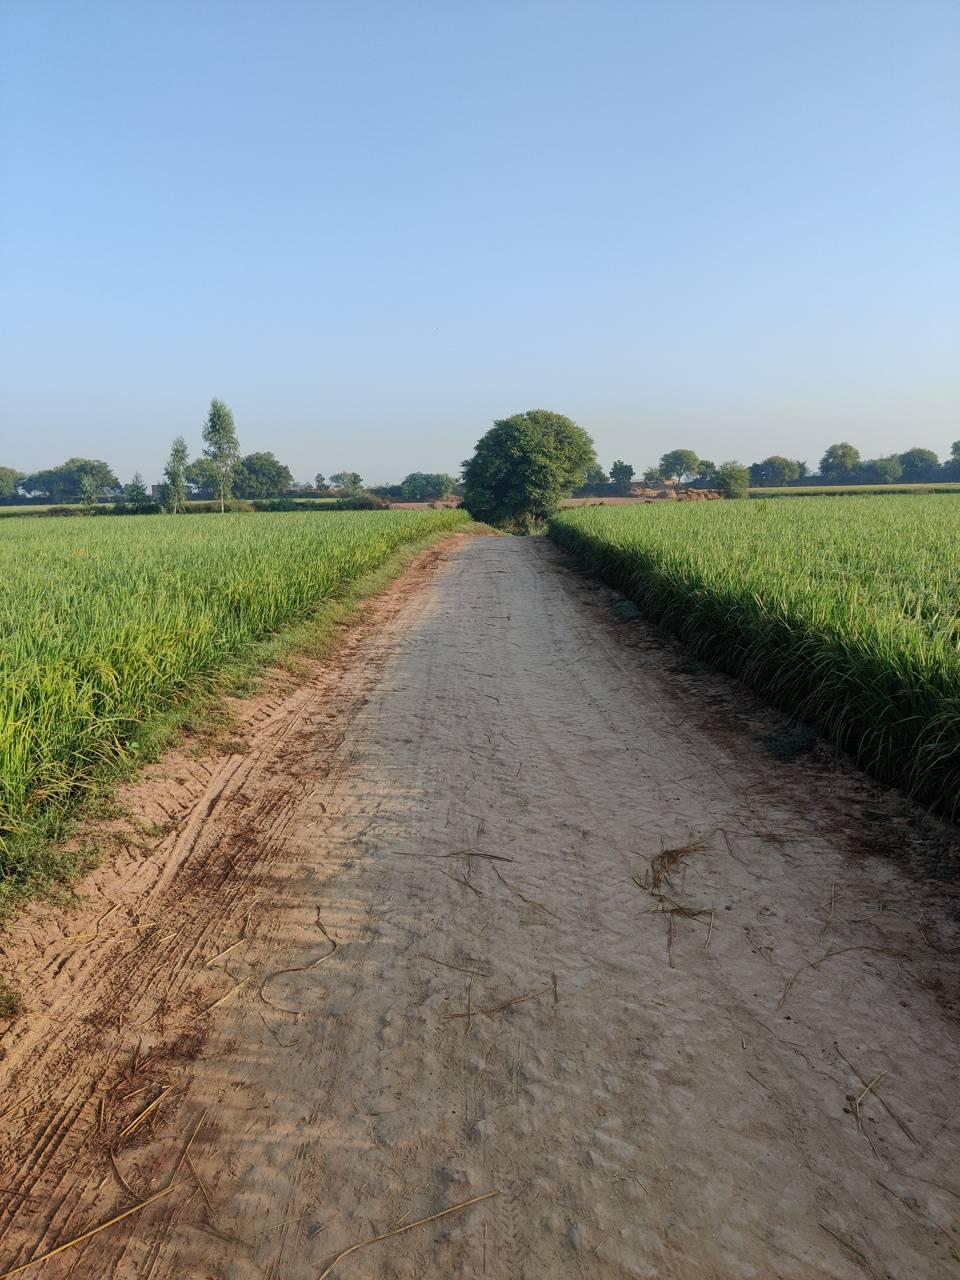 Cycling roads